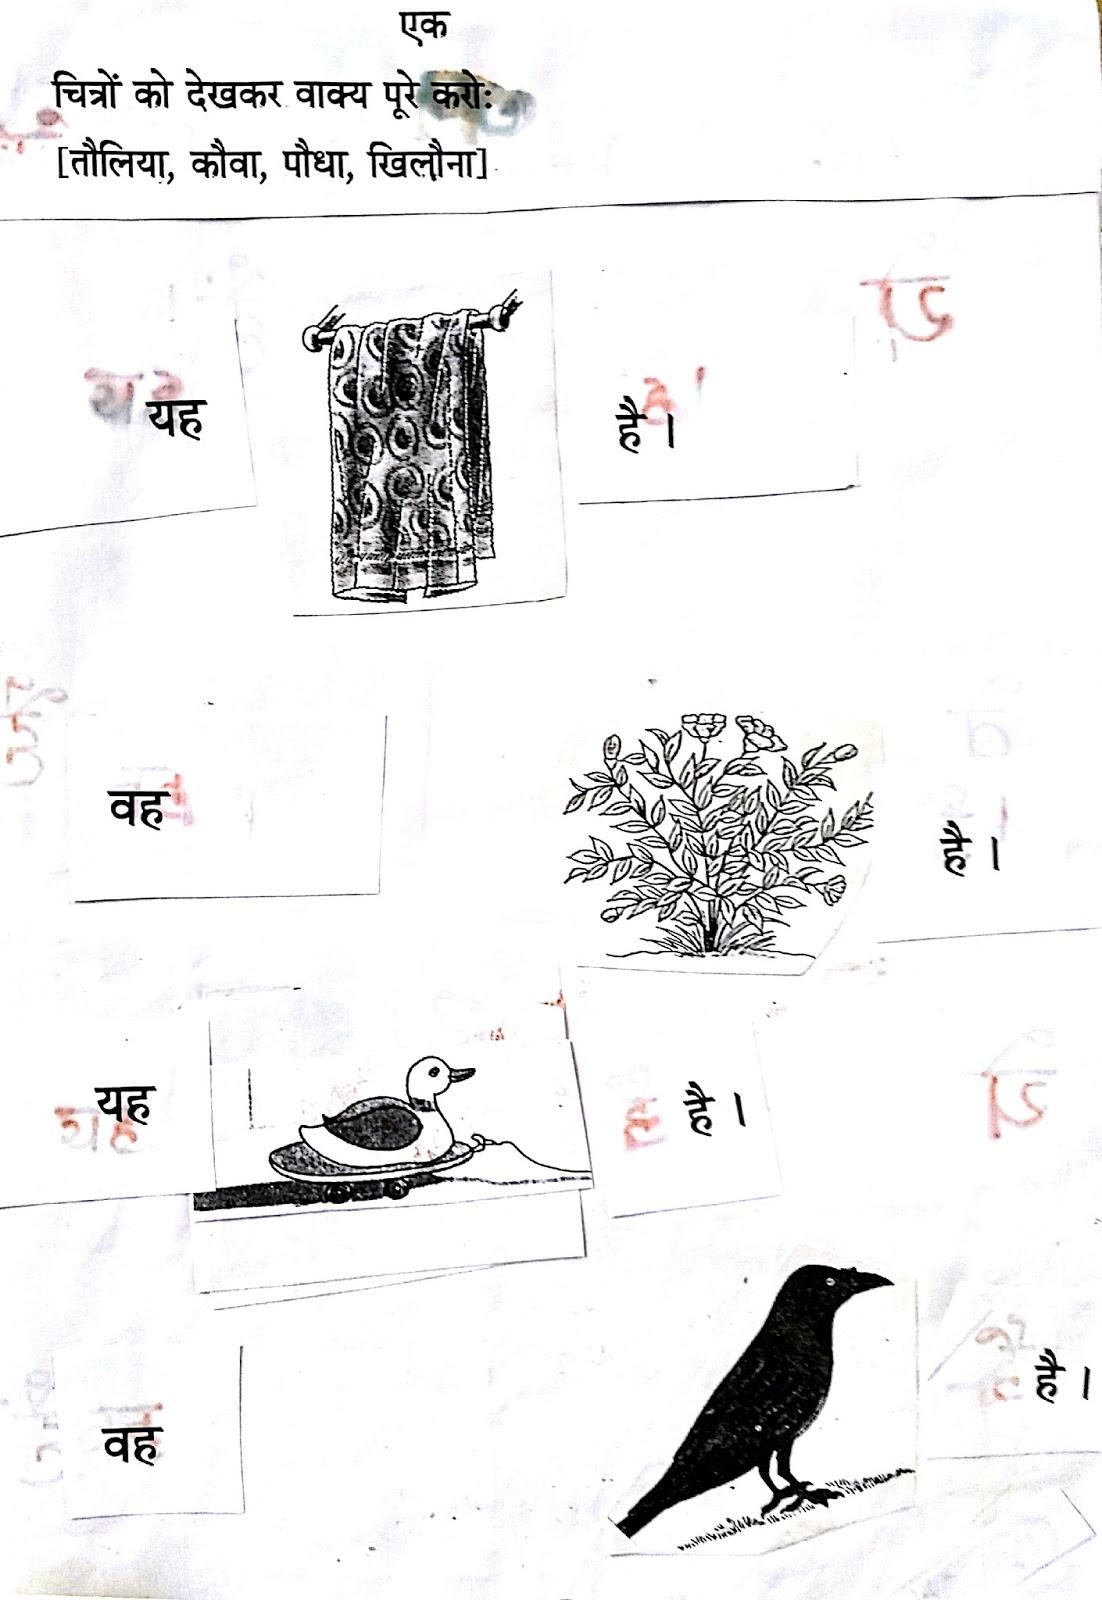 Hindi Grammar Work Sheet Collection For Classes 5 6 7 Amp 8 Singular Plural Work Sheets Fpr